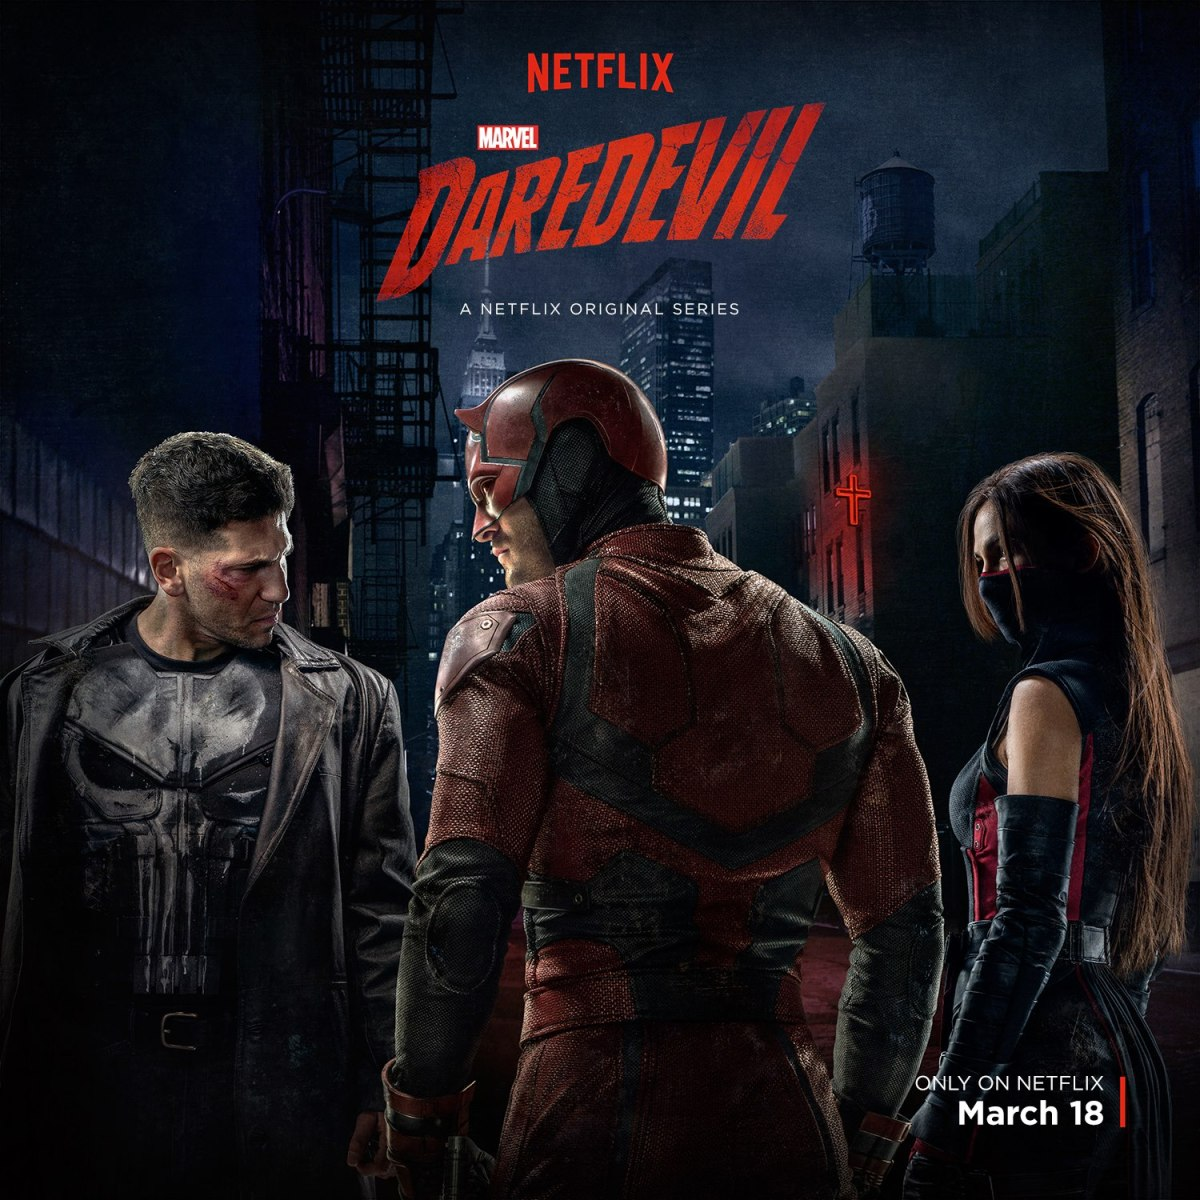 Review: Netflix's 'Daredevil' returns in season 2 for more vigilantehijinks